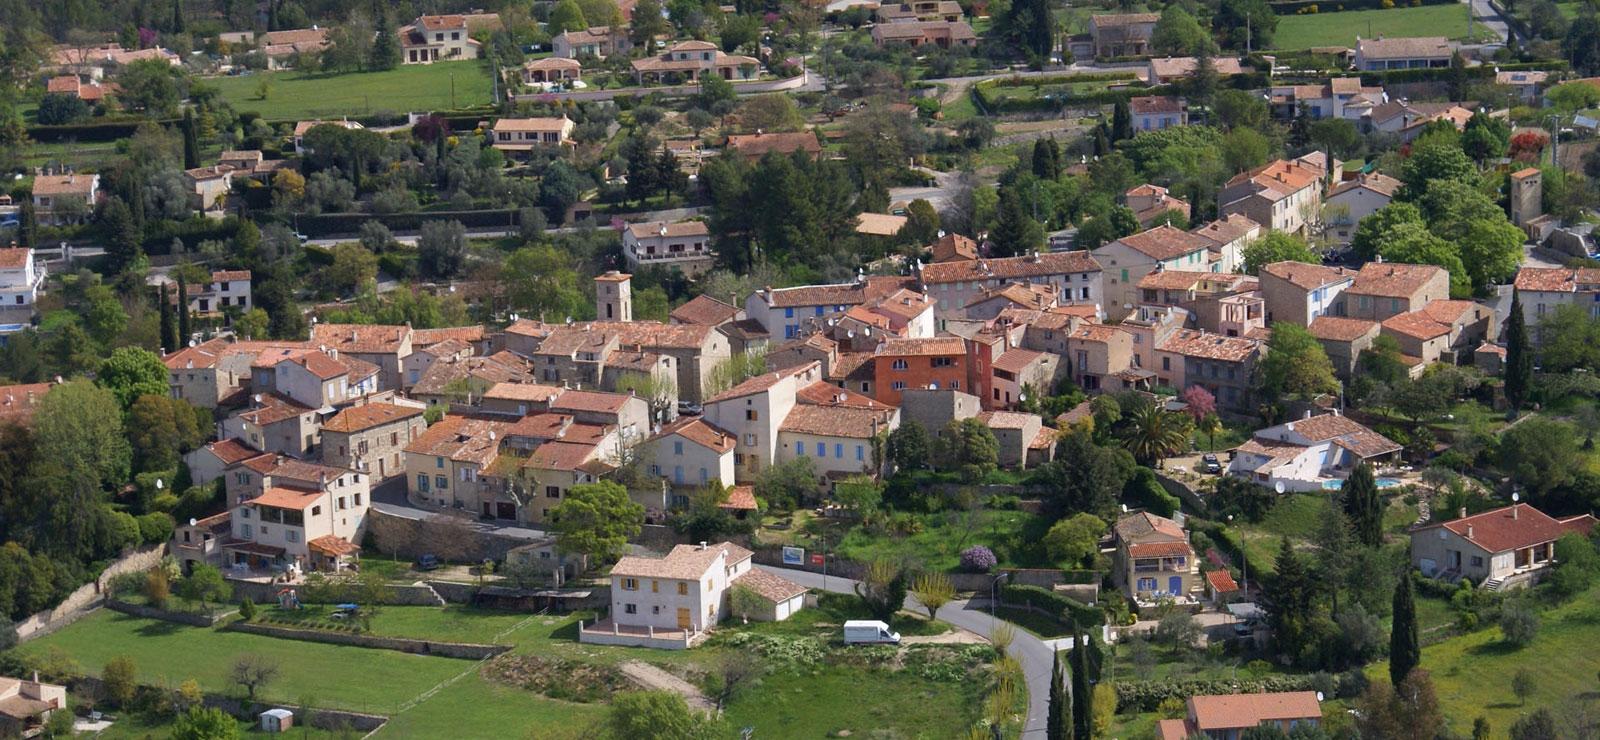 saint-paull-en-foret pays de fayence